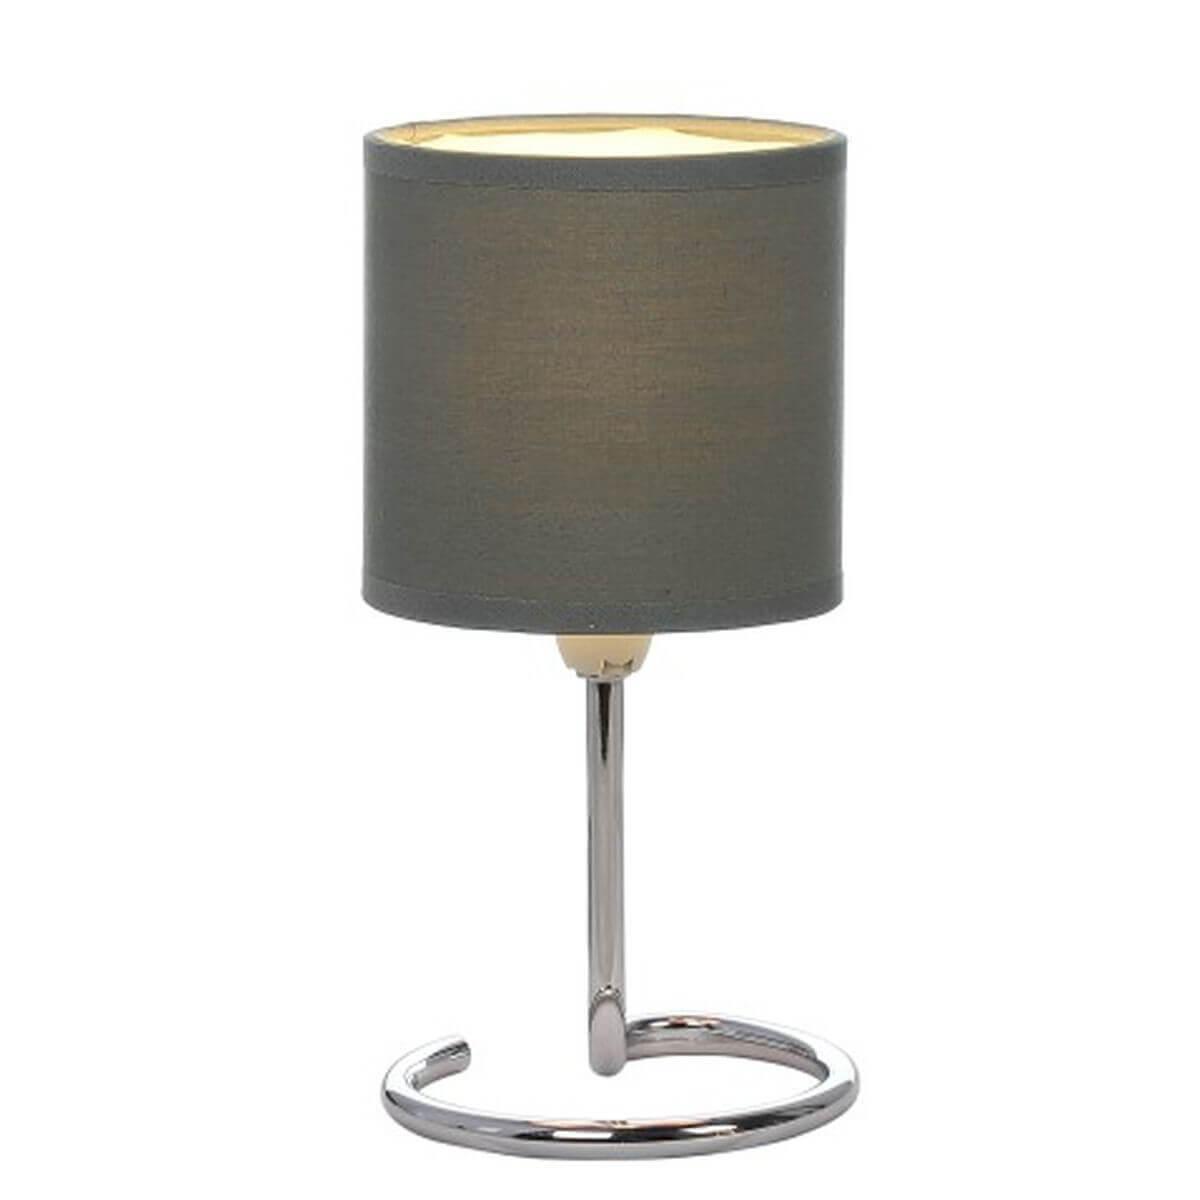 Настольная лампа Globo 24639DG Elfi elfi beck purposeful singleness